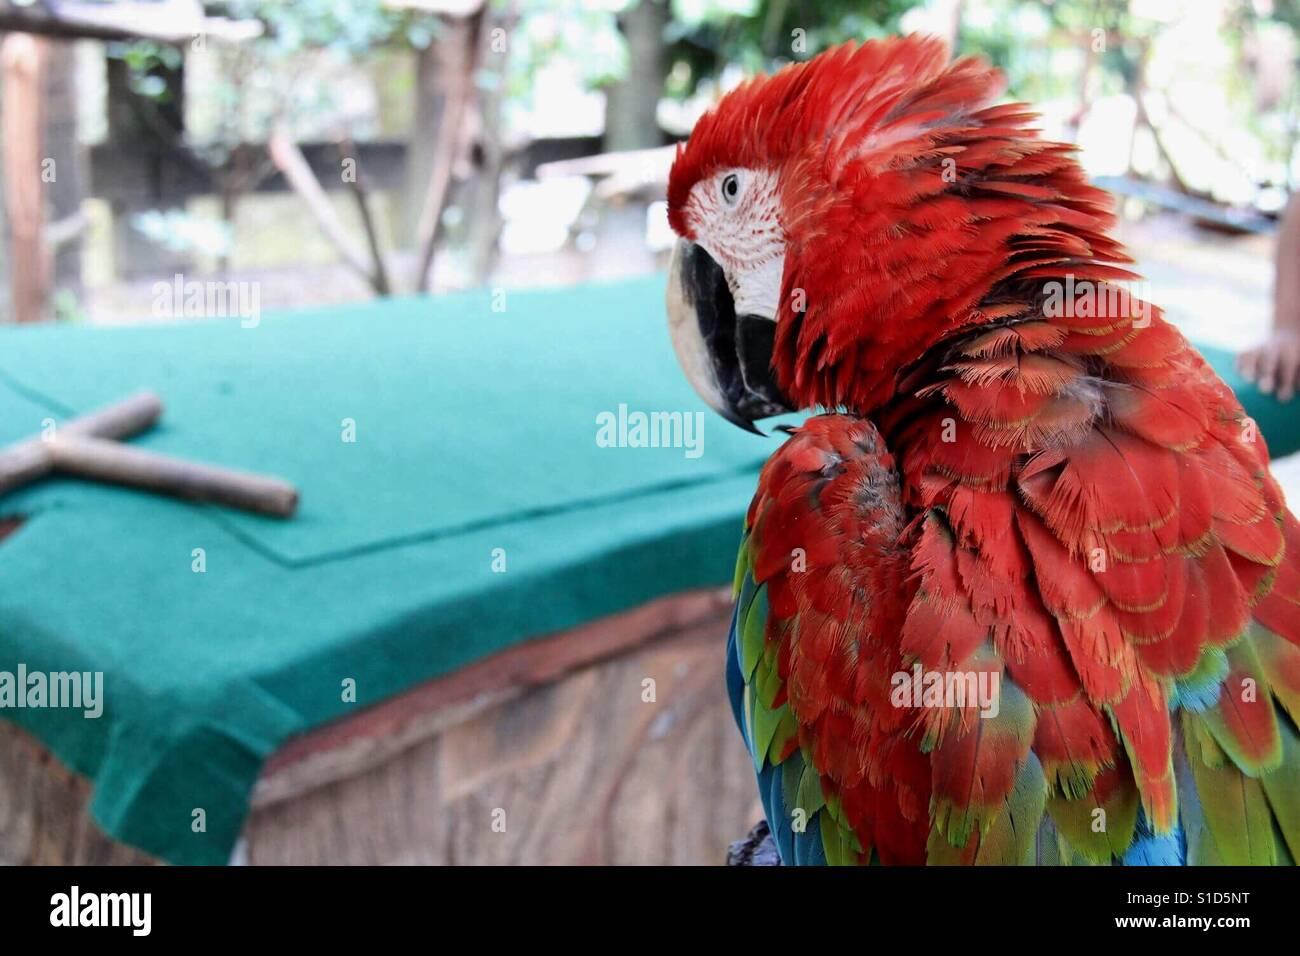 Parrots Also Known As Psittacines ˈsɪtəsaɪnz 2 3 Are